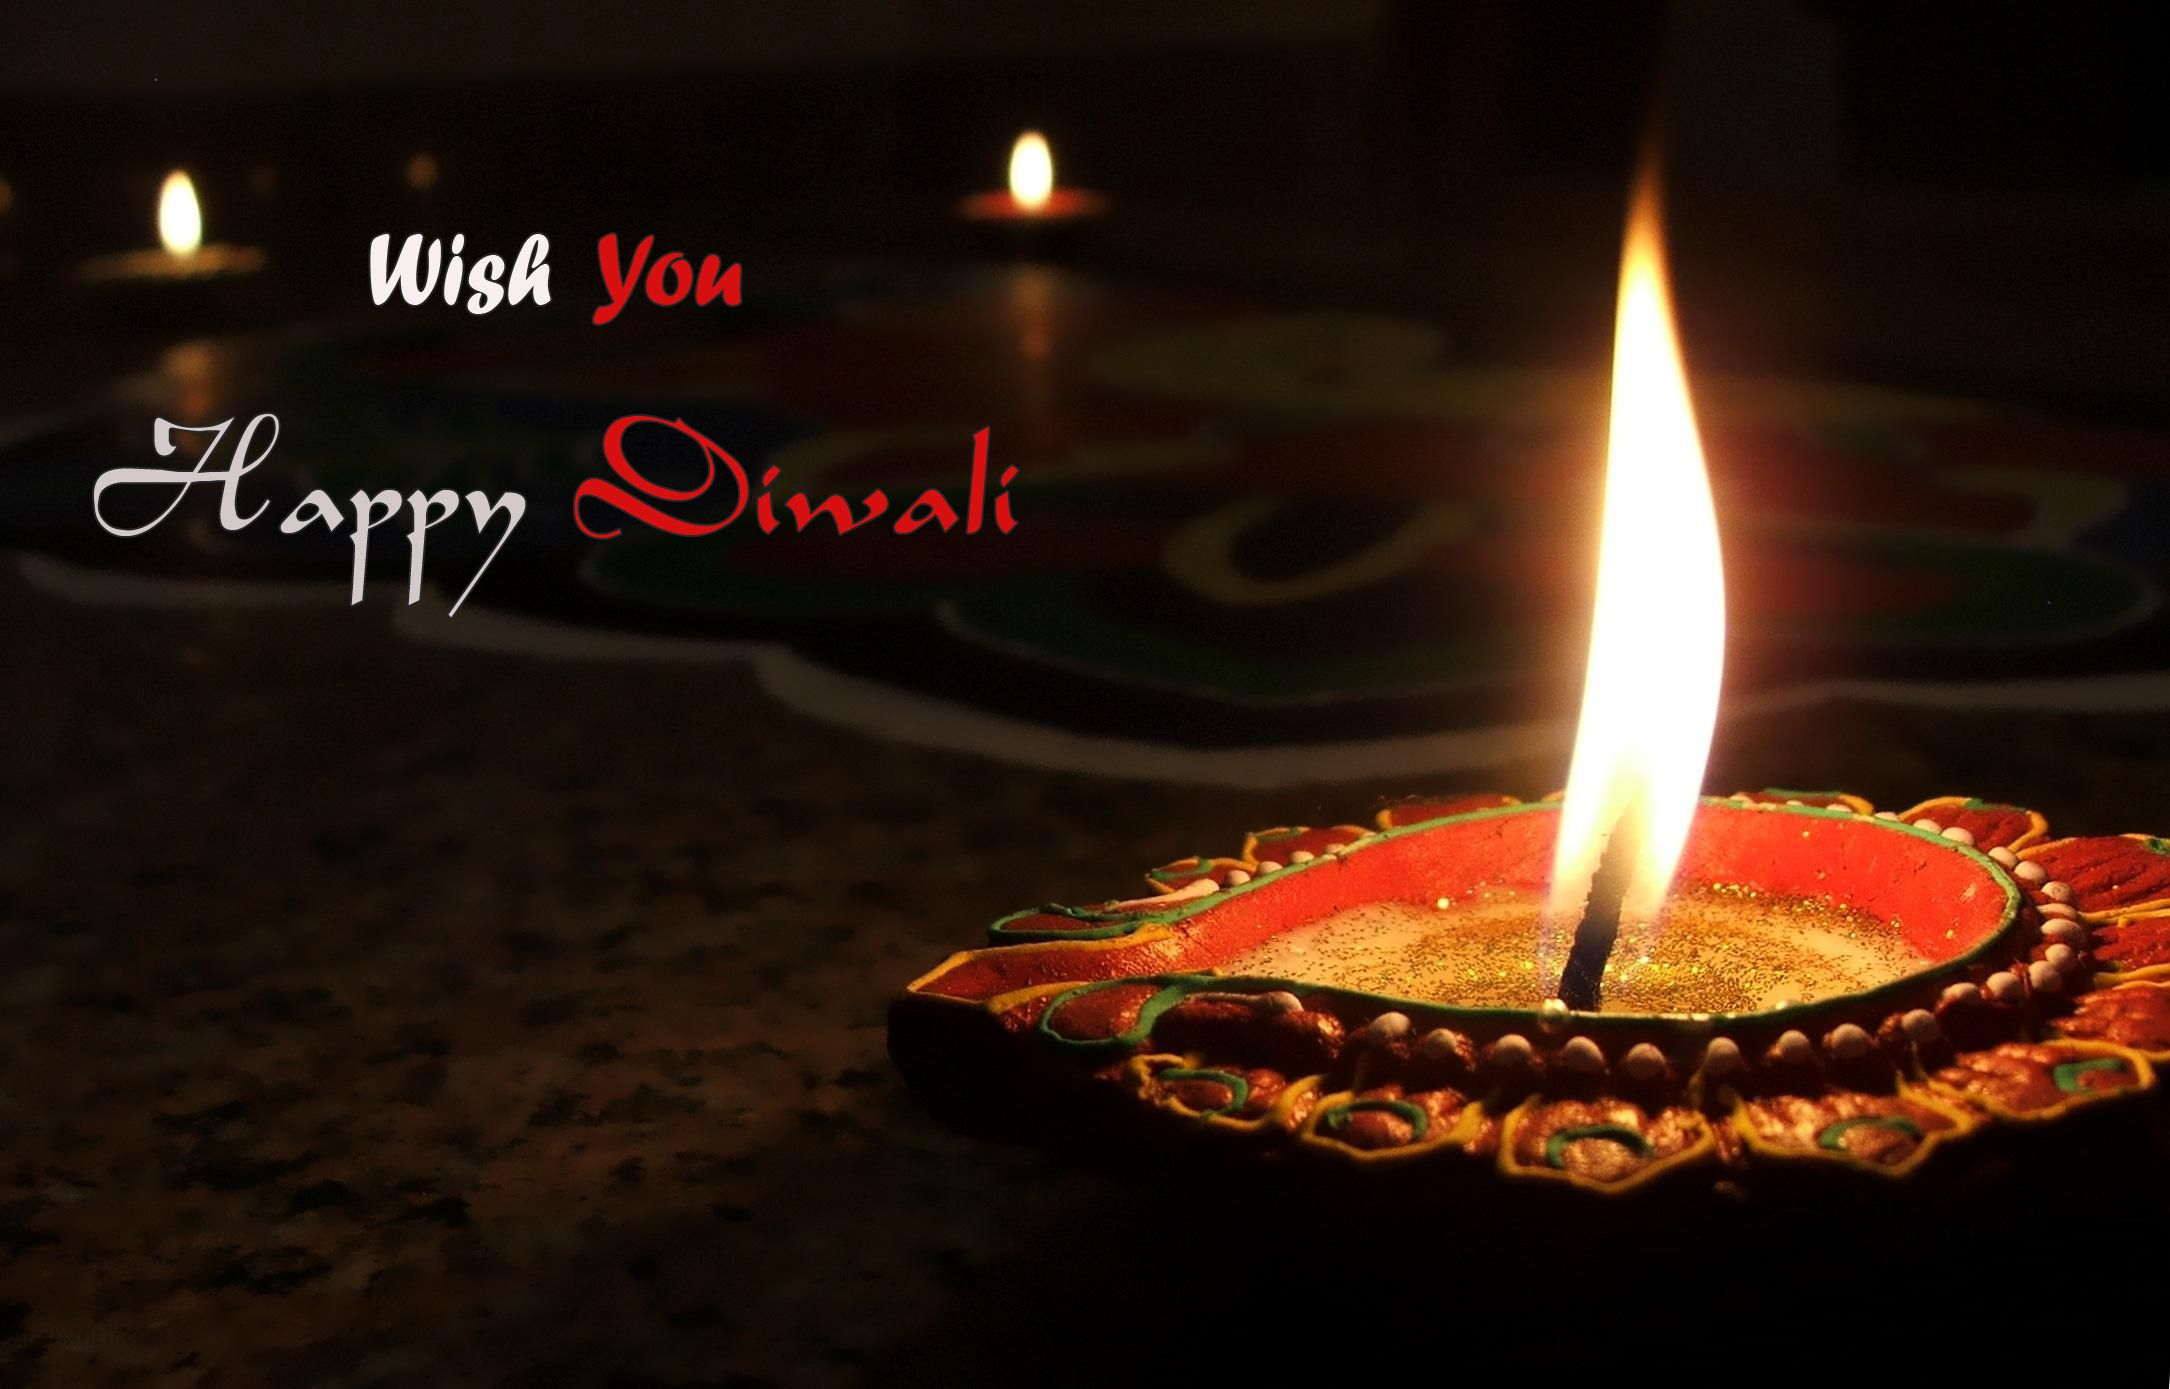 Happy Diwali Images Hd Wallpapers Happy Diwali Images Hd